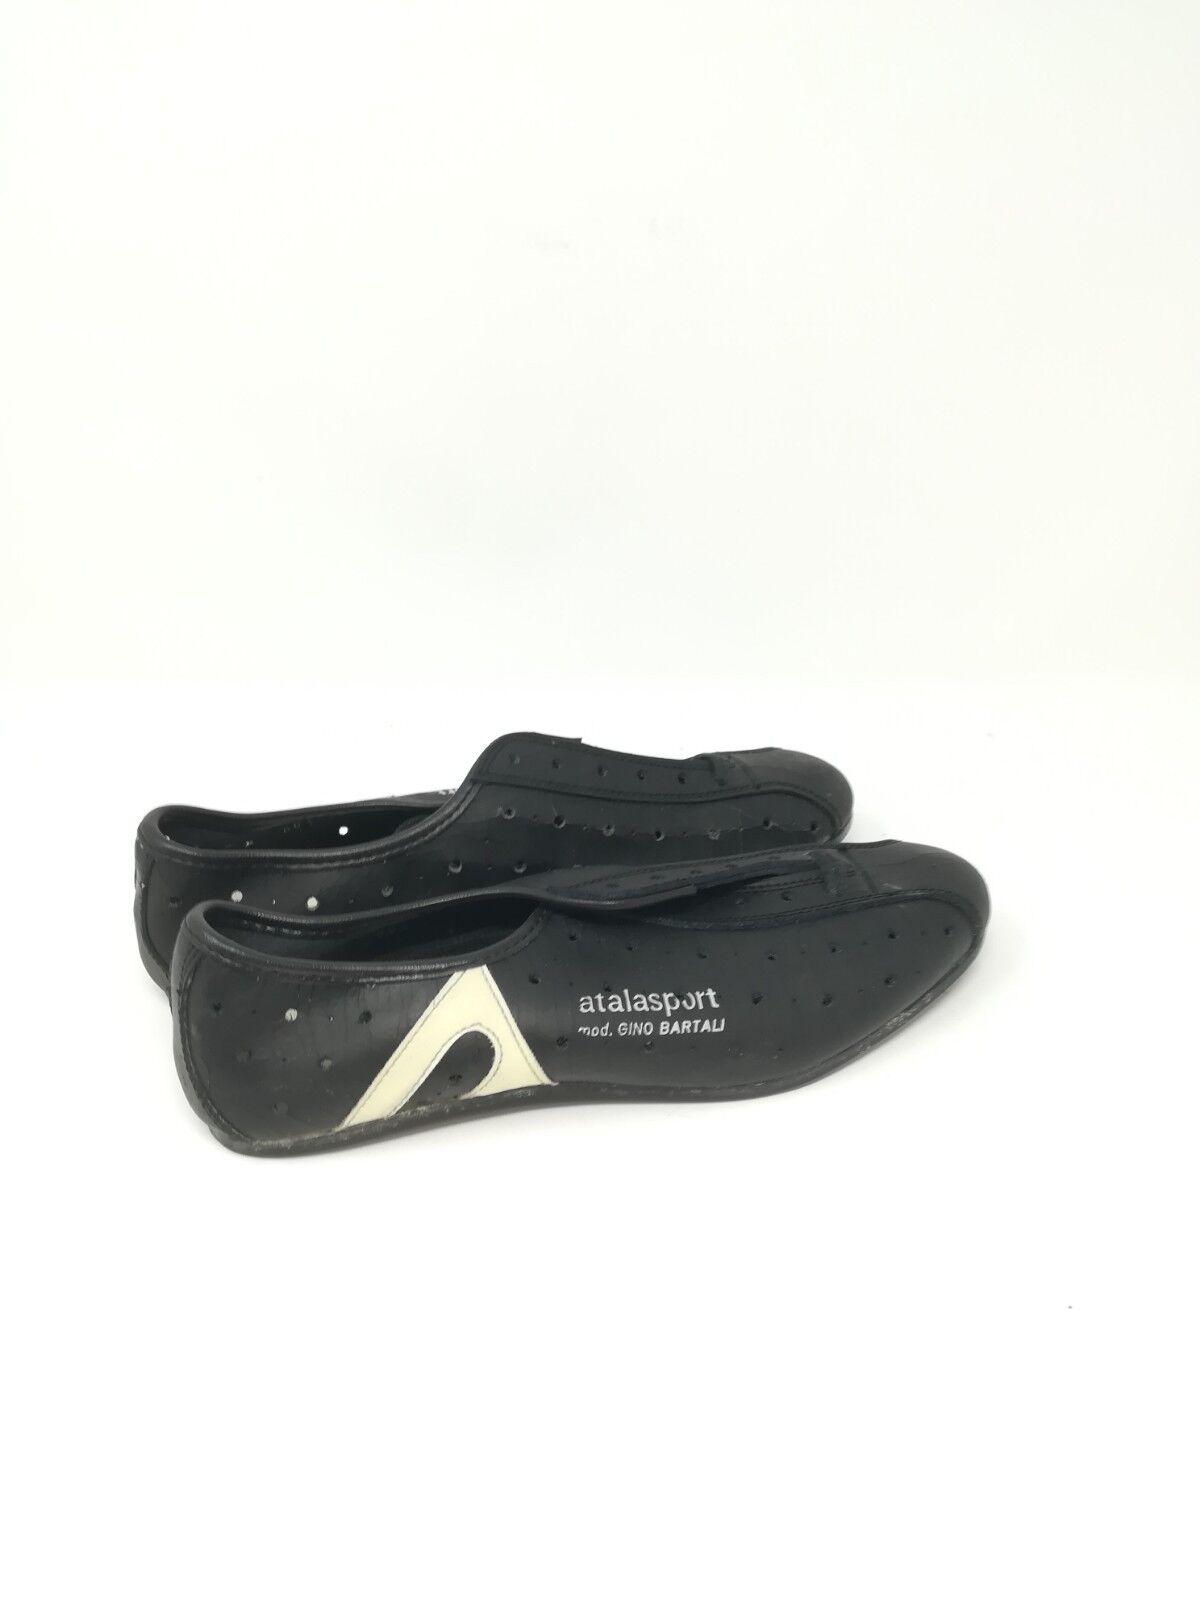 Vintage scarpe ciclismo cycling schuhe  Gino Atala sport  Gino  Bartali 40  NOS 9590d5